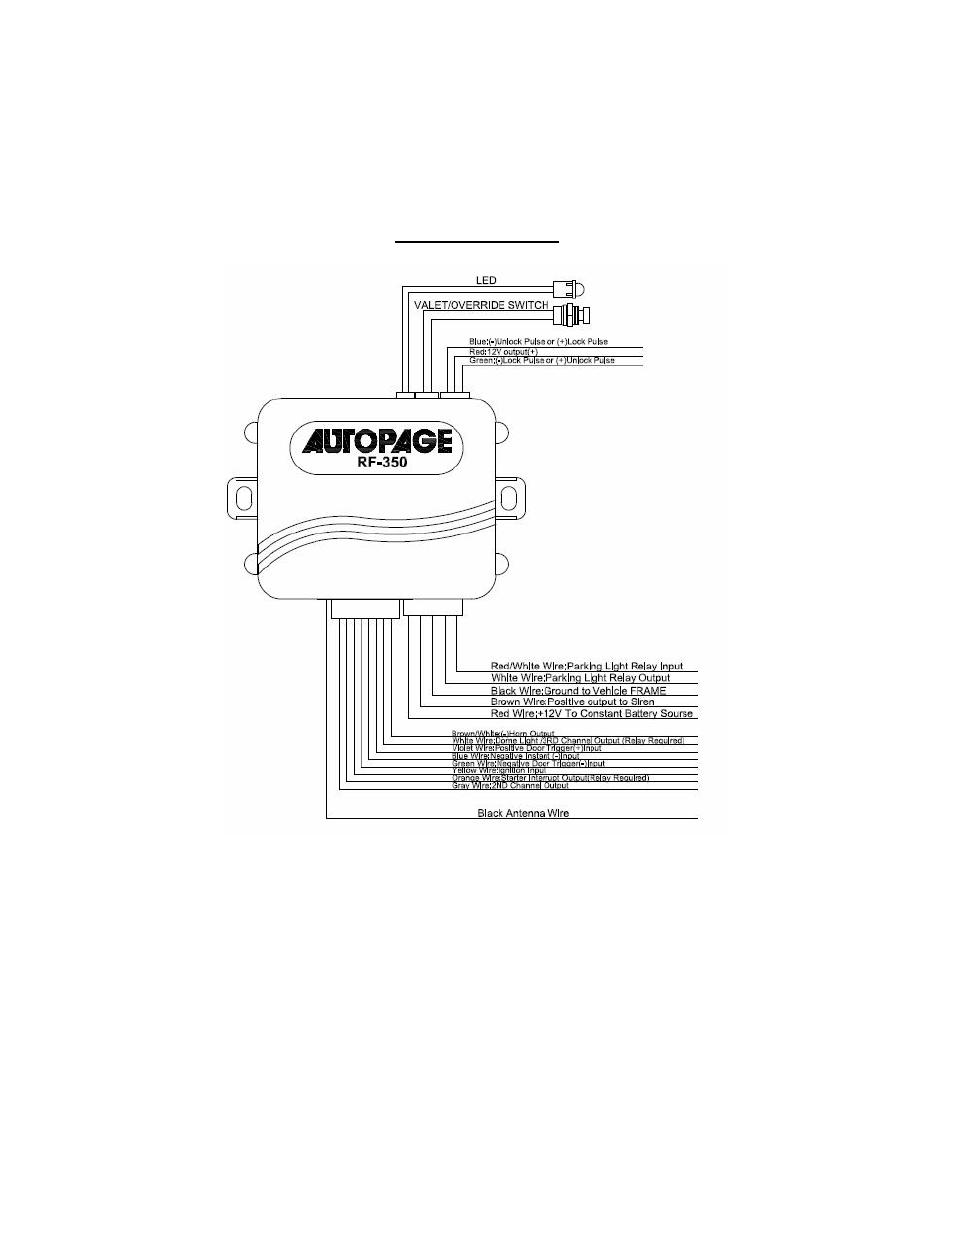 medium resolution of autopage wiring diagram wiring diagram dat autopage rf 220 wiring diagram autopage wiring diagram